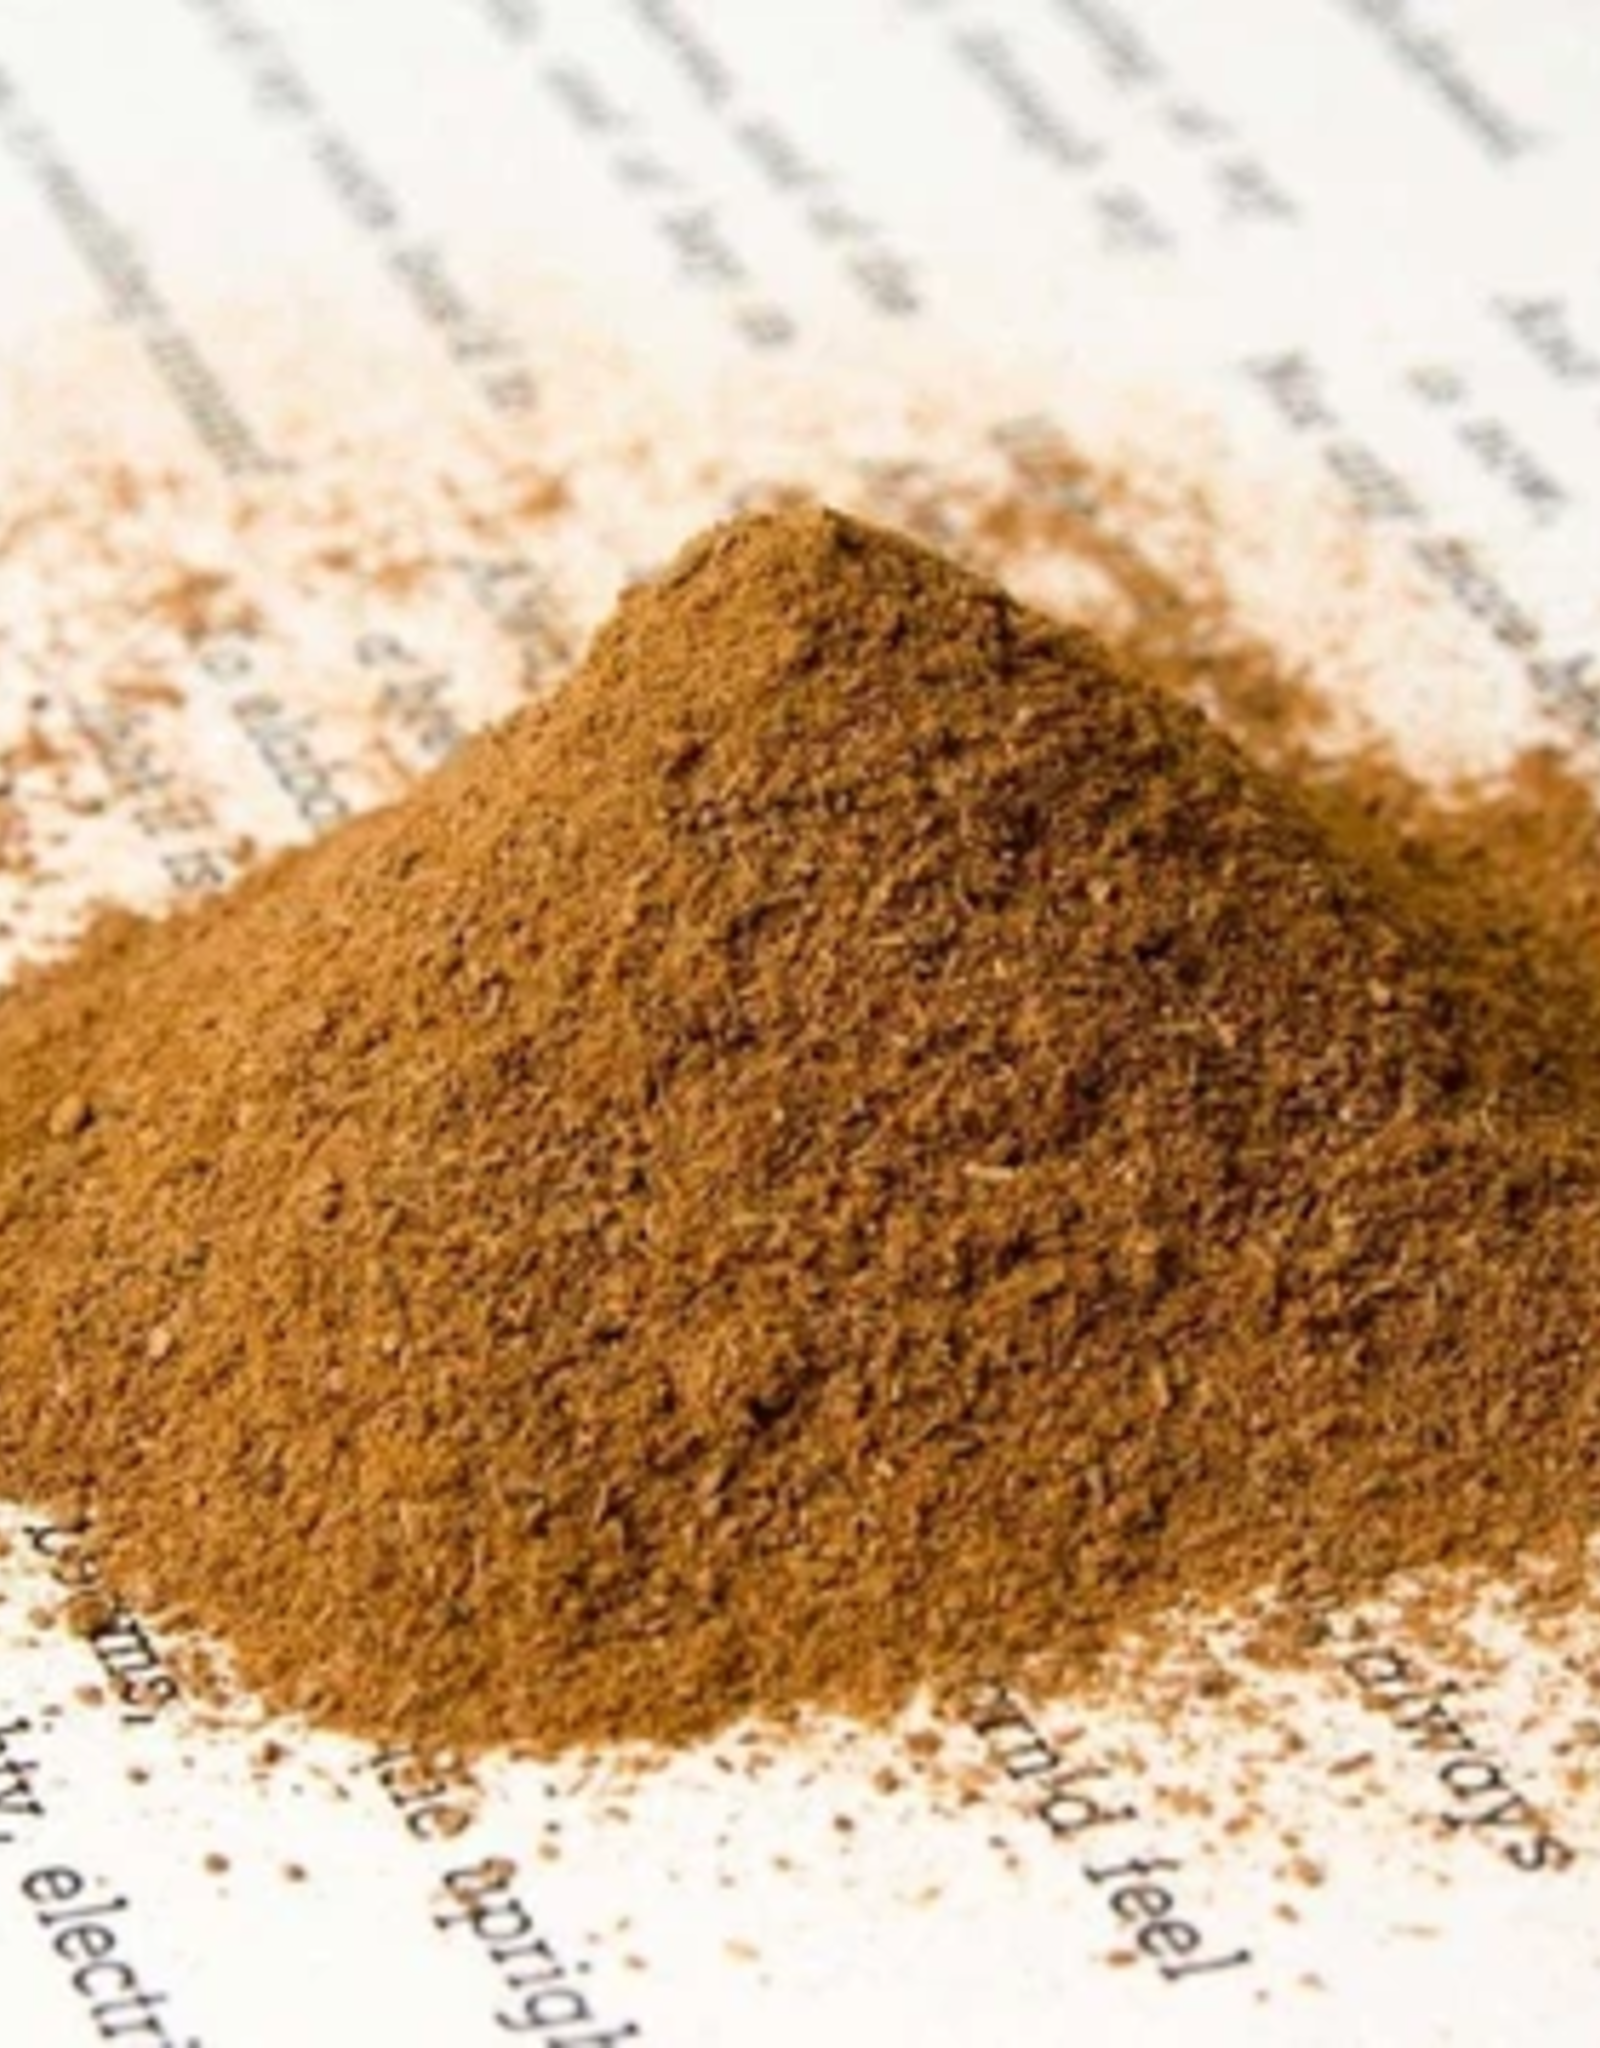 Burlap & Barrel Cinnamon Verum Shavings